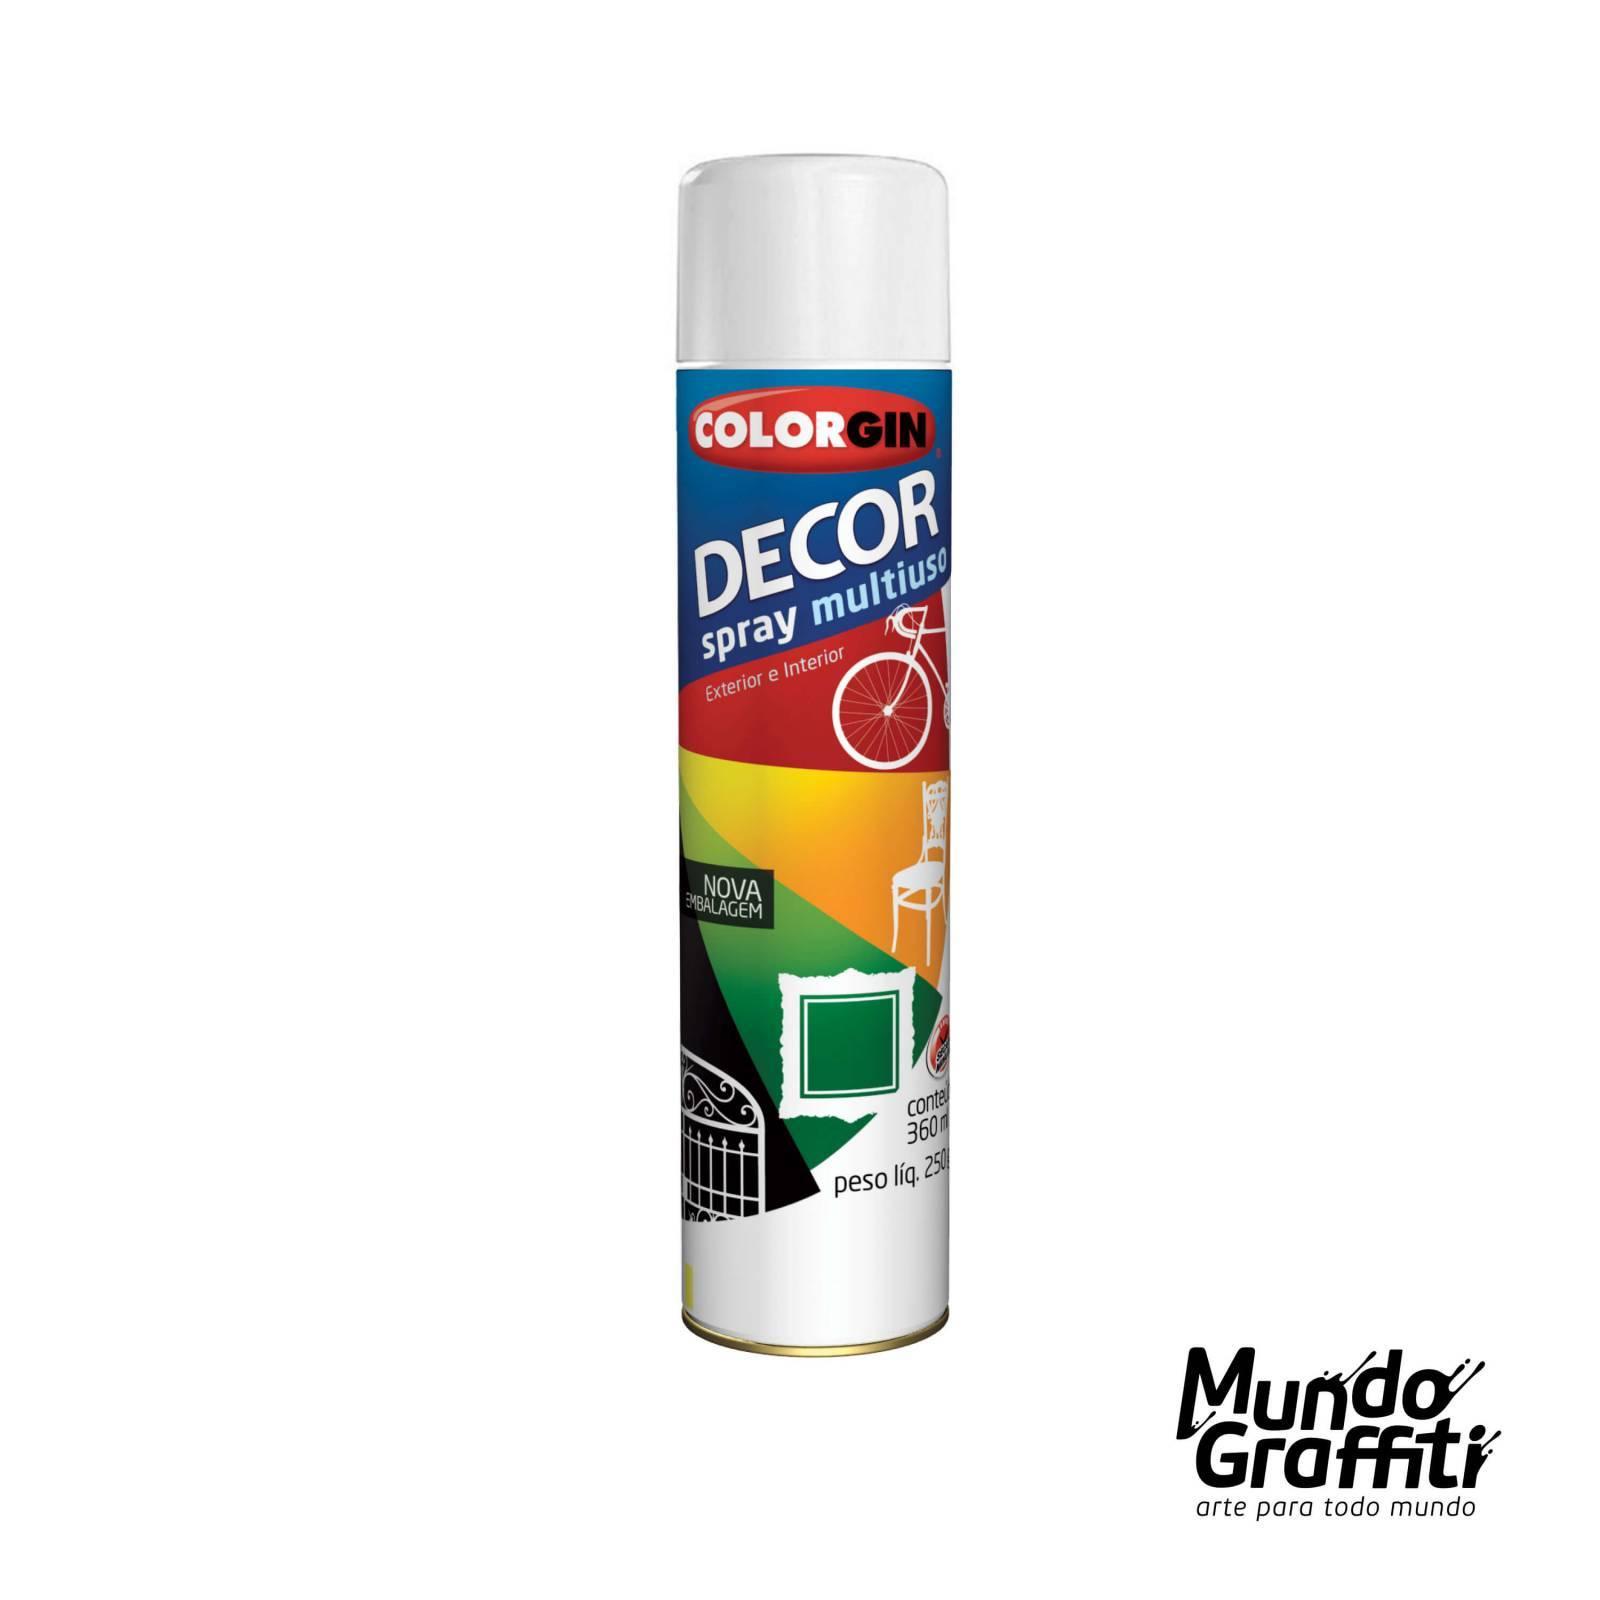 Tinta Spray Colorgin Decor 8641 Branco Brilhante 360ml - Mundo Graffiti